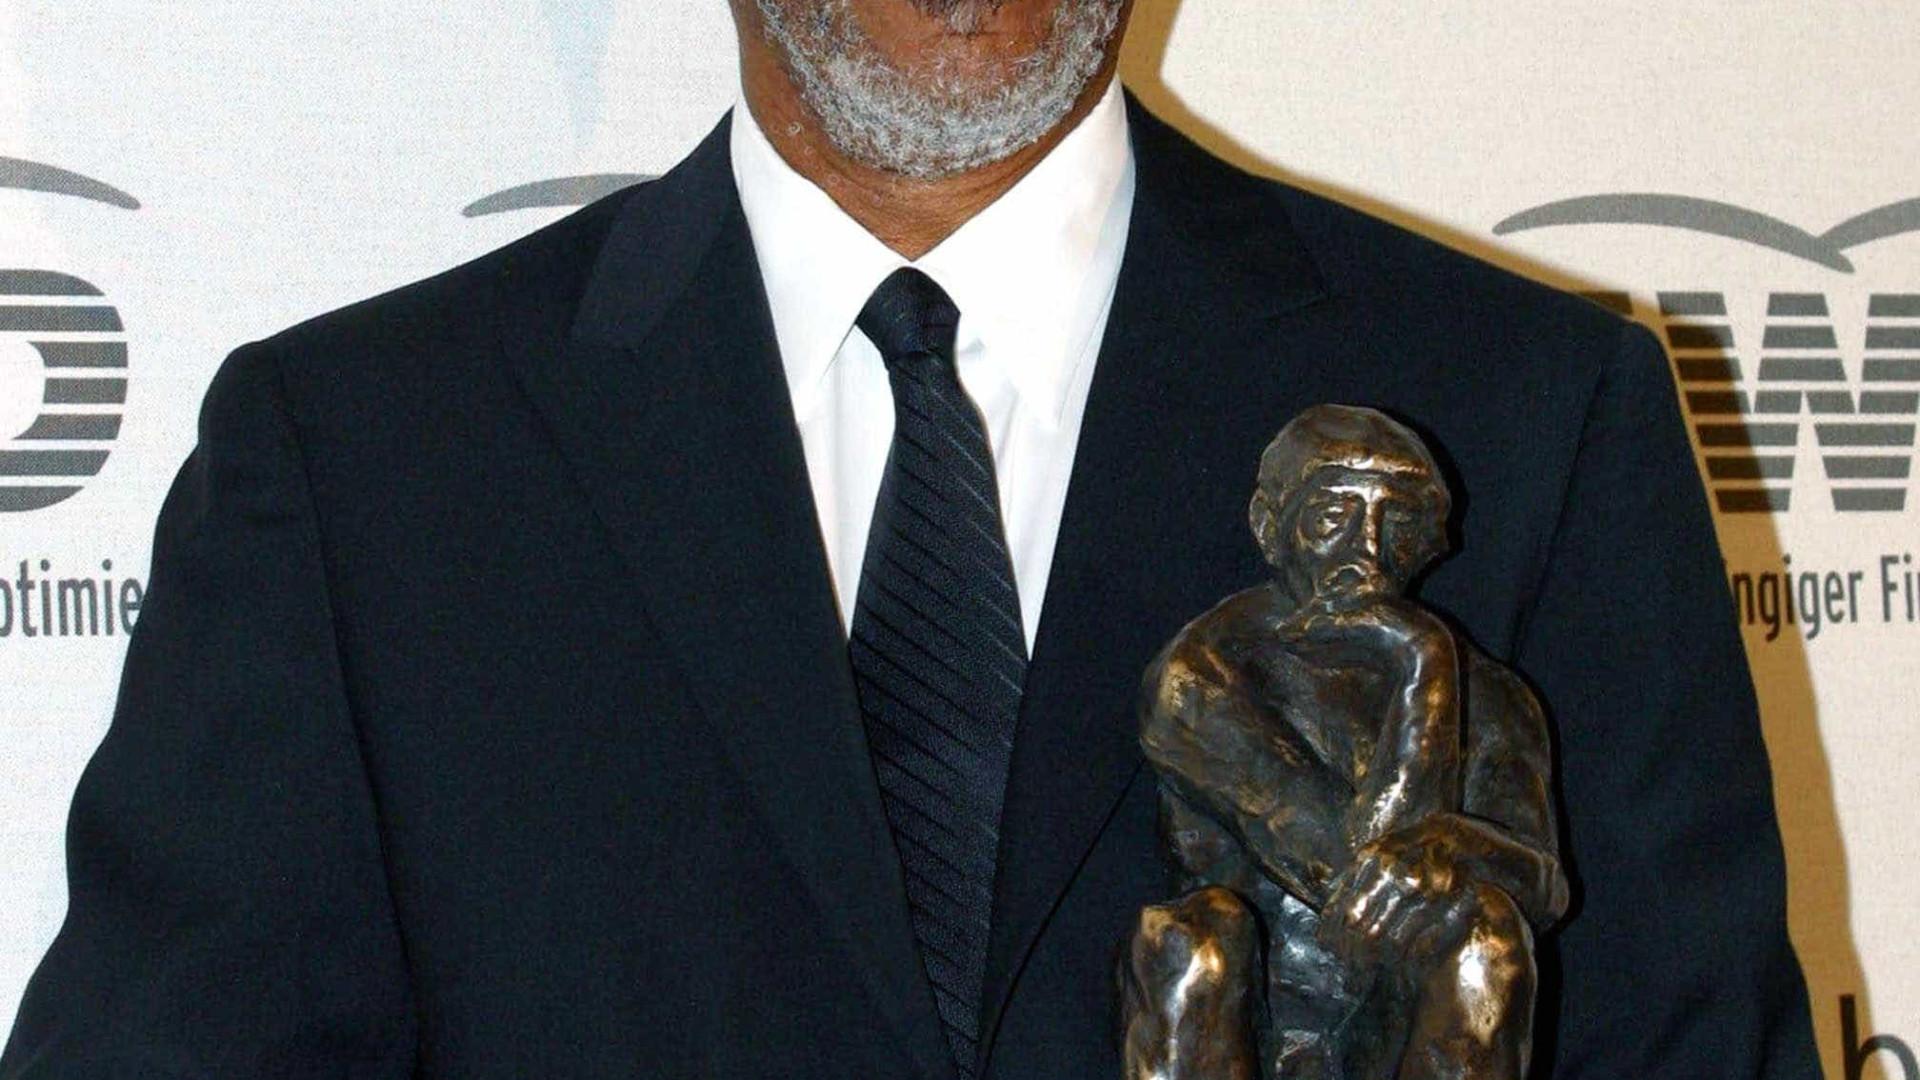 Oito mulheres acusam Morgan Freeman de assédio sexual